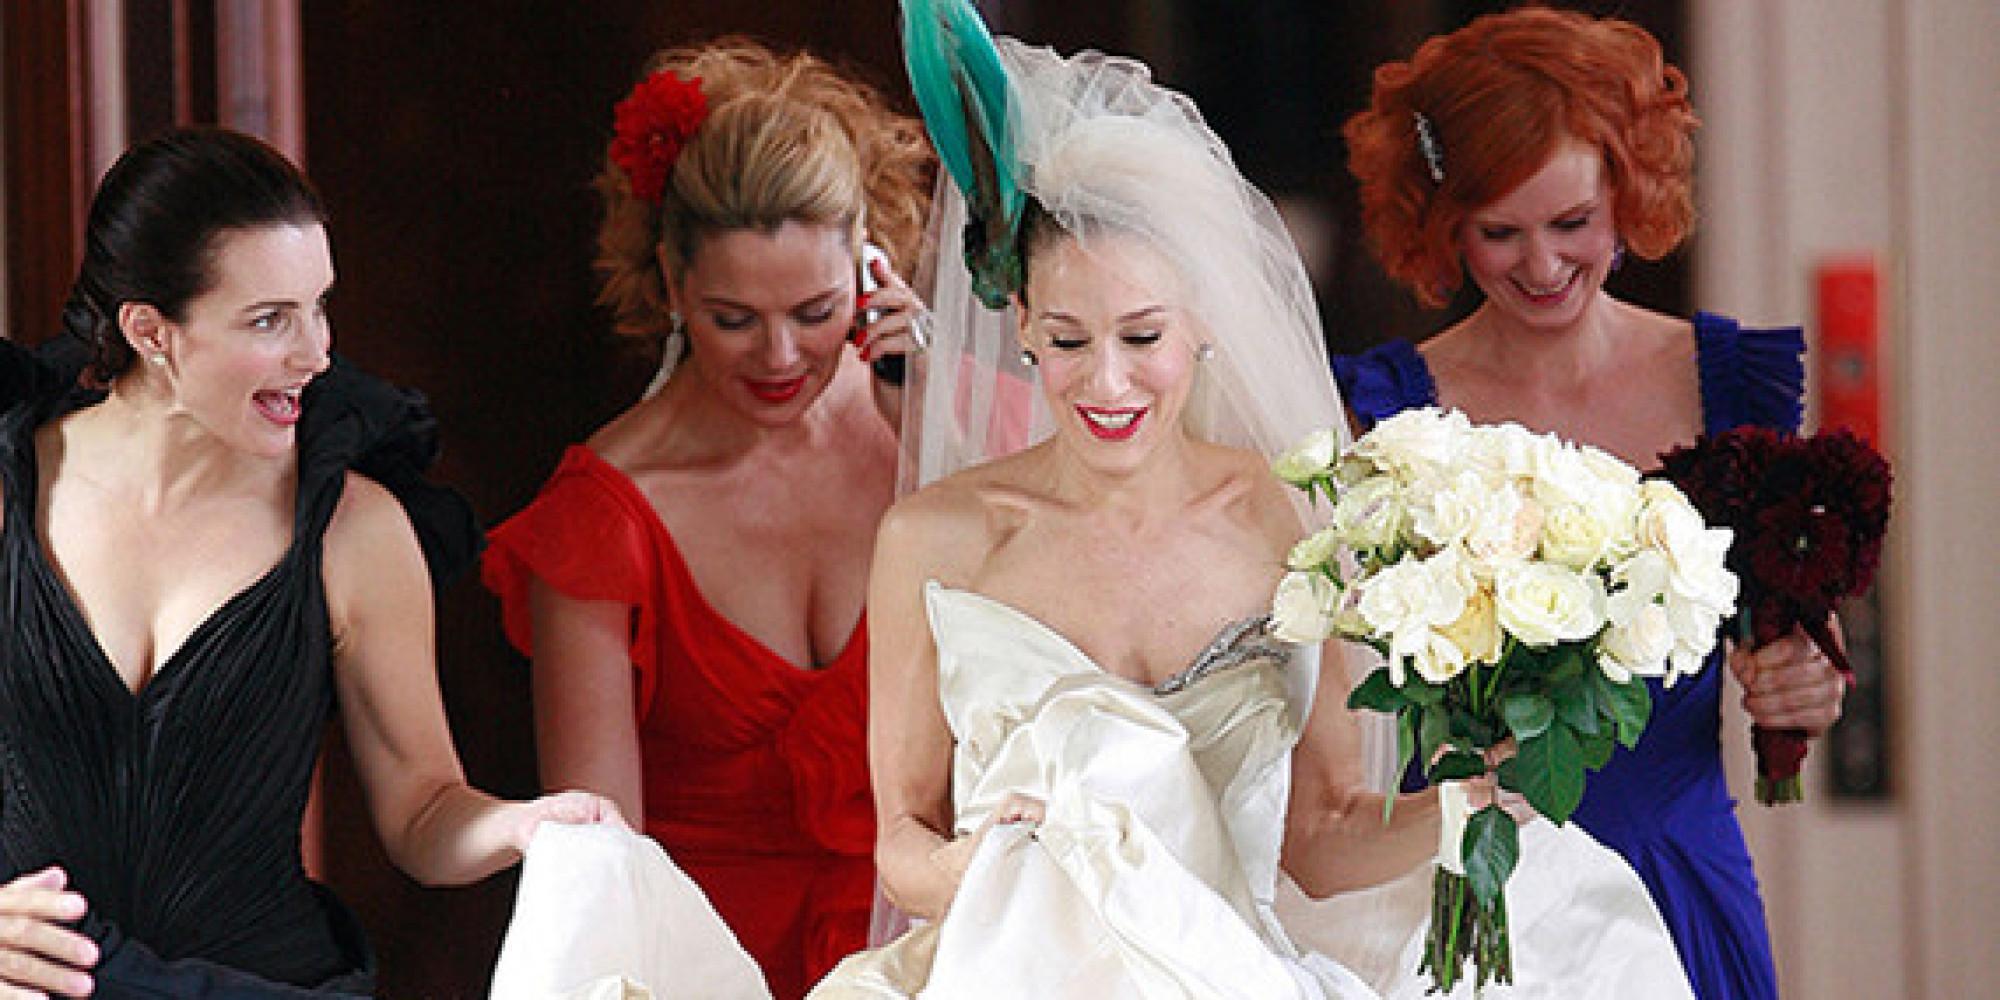 sex and the city wedding dresses – Fashion dresses